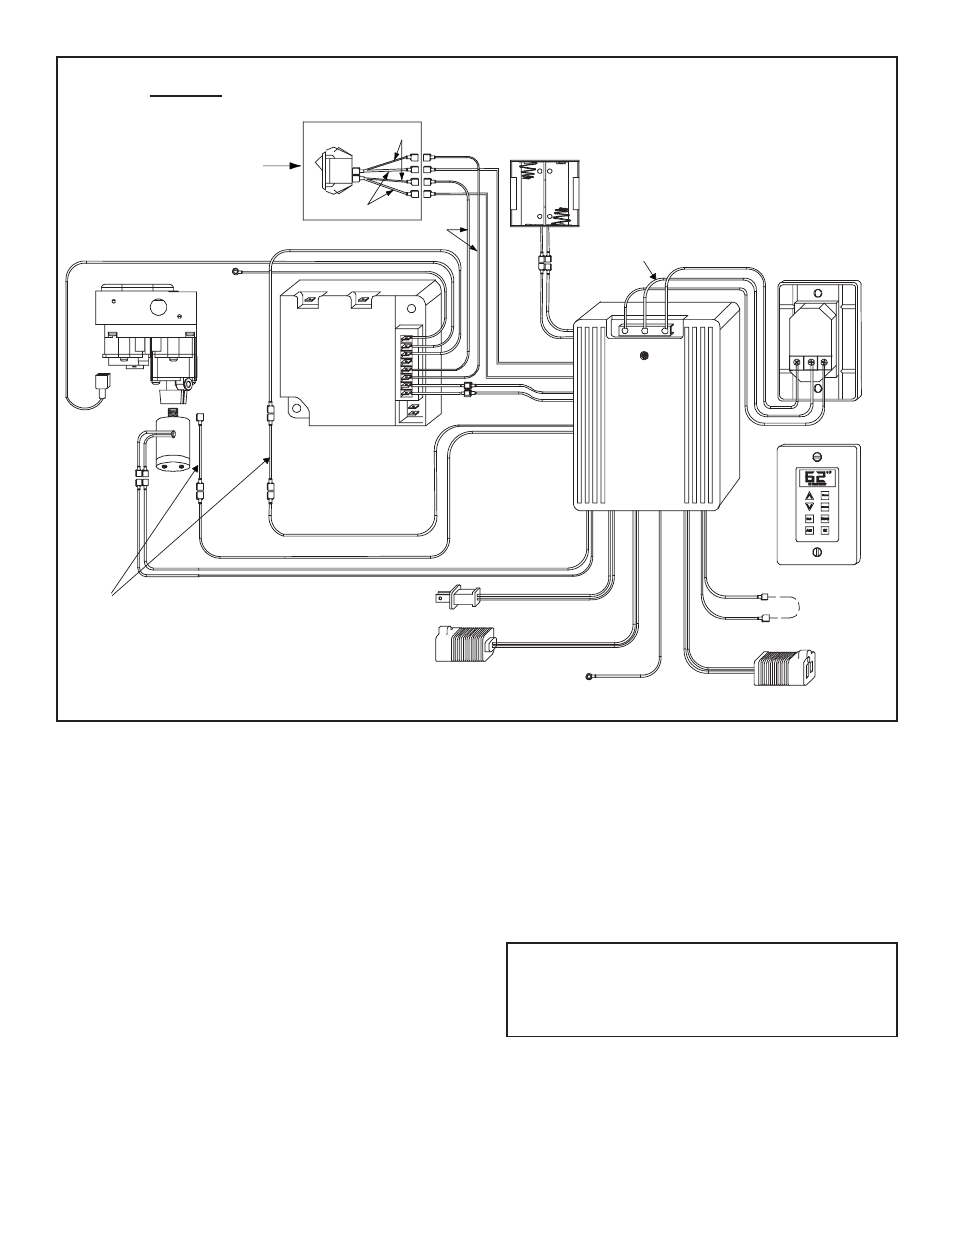 Mlt 1 Wiring Diagram - Wiring Diagram Local Manitou Wiring Diagrams on